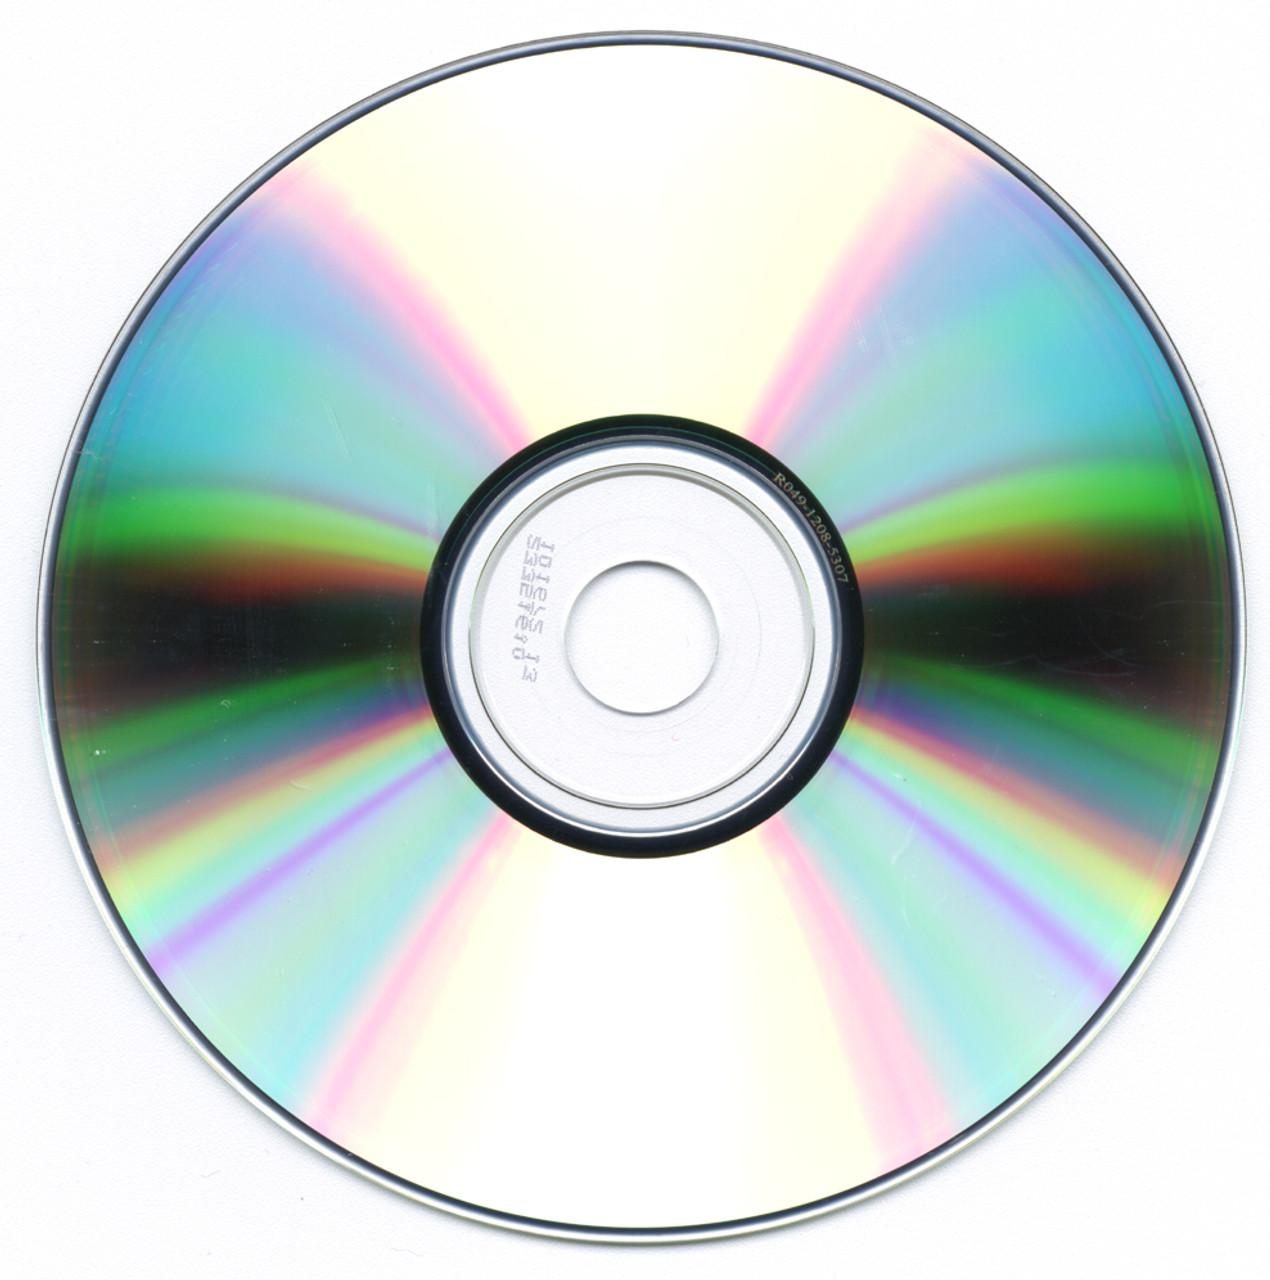 TorRey W-Label & WLS / WLSD Scale Software - Windows 8 & 10 - x86